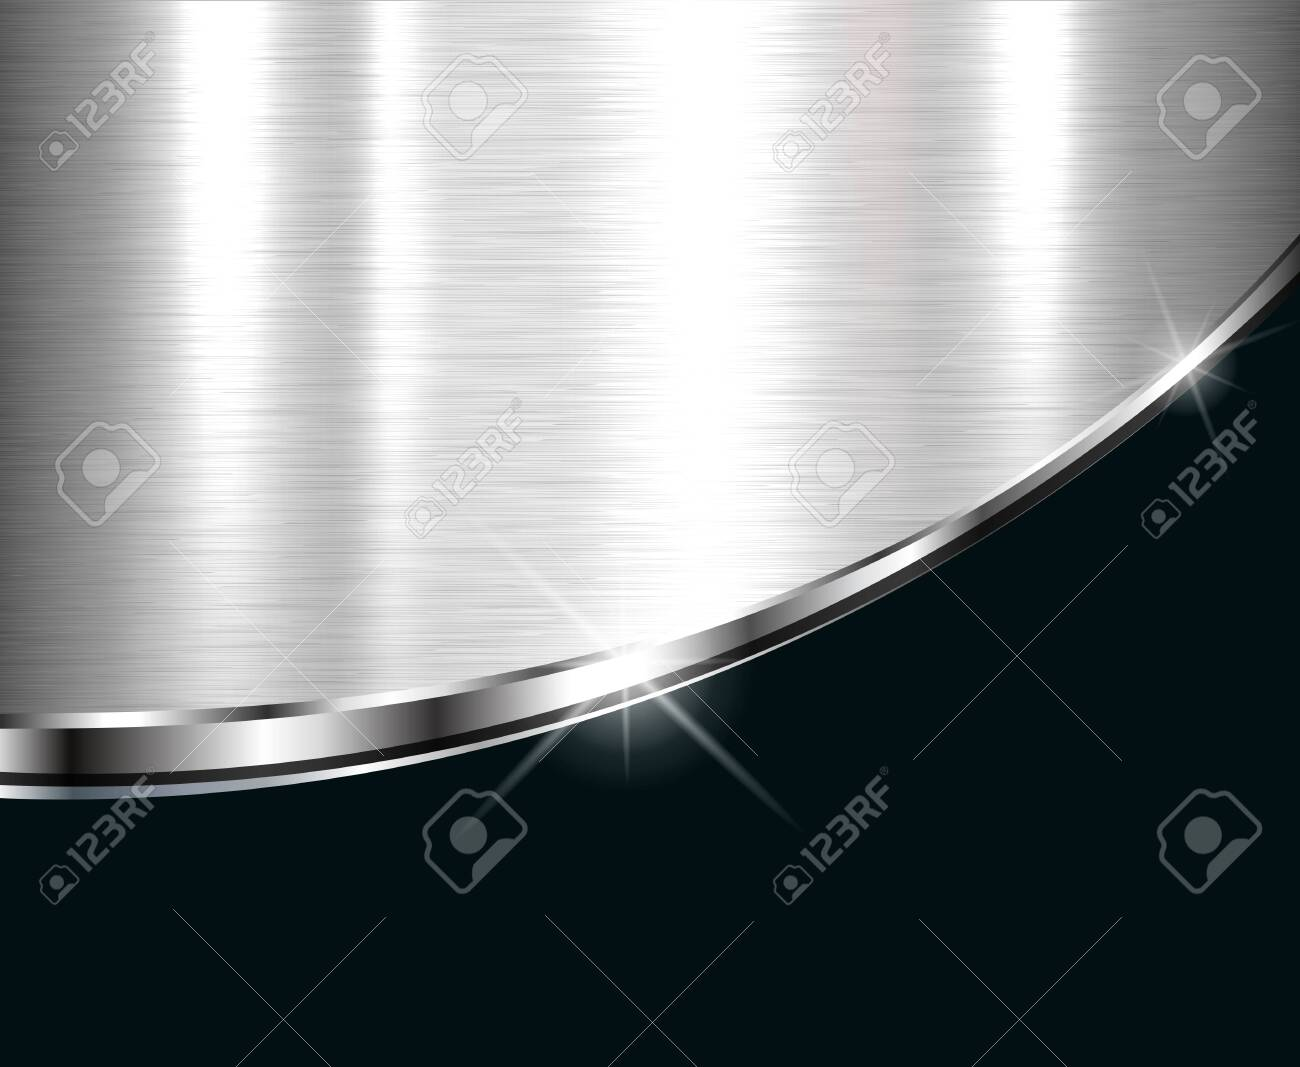 Elegant metallic background, vector design. - 140240950